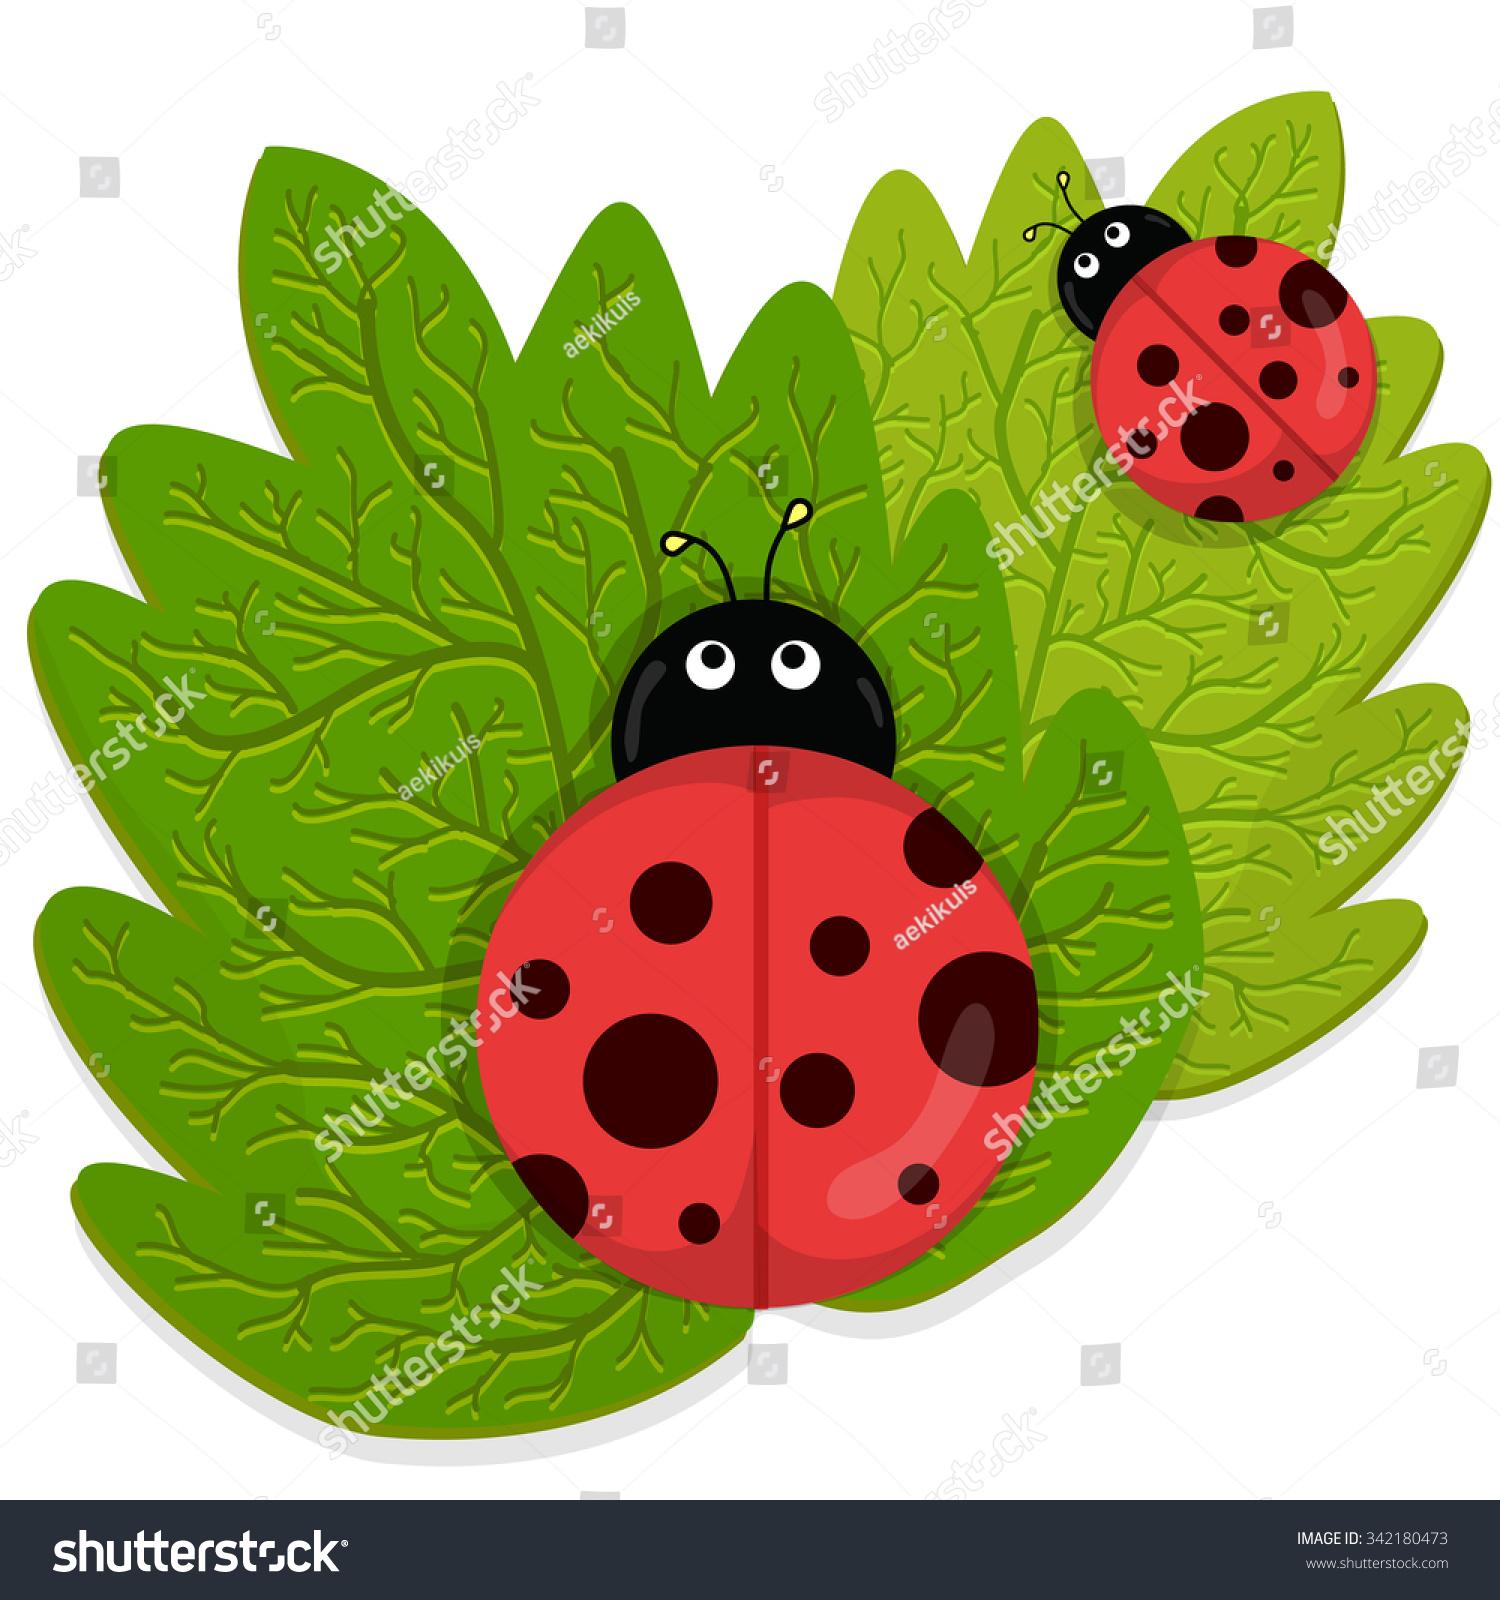 Ladybug On Green Leaf Stock Vector 342180473 - Shutterstock for Clipart Ladybug On Leaf  117dqh